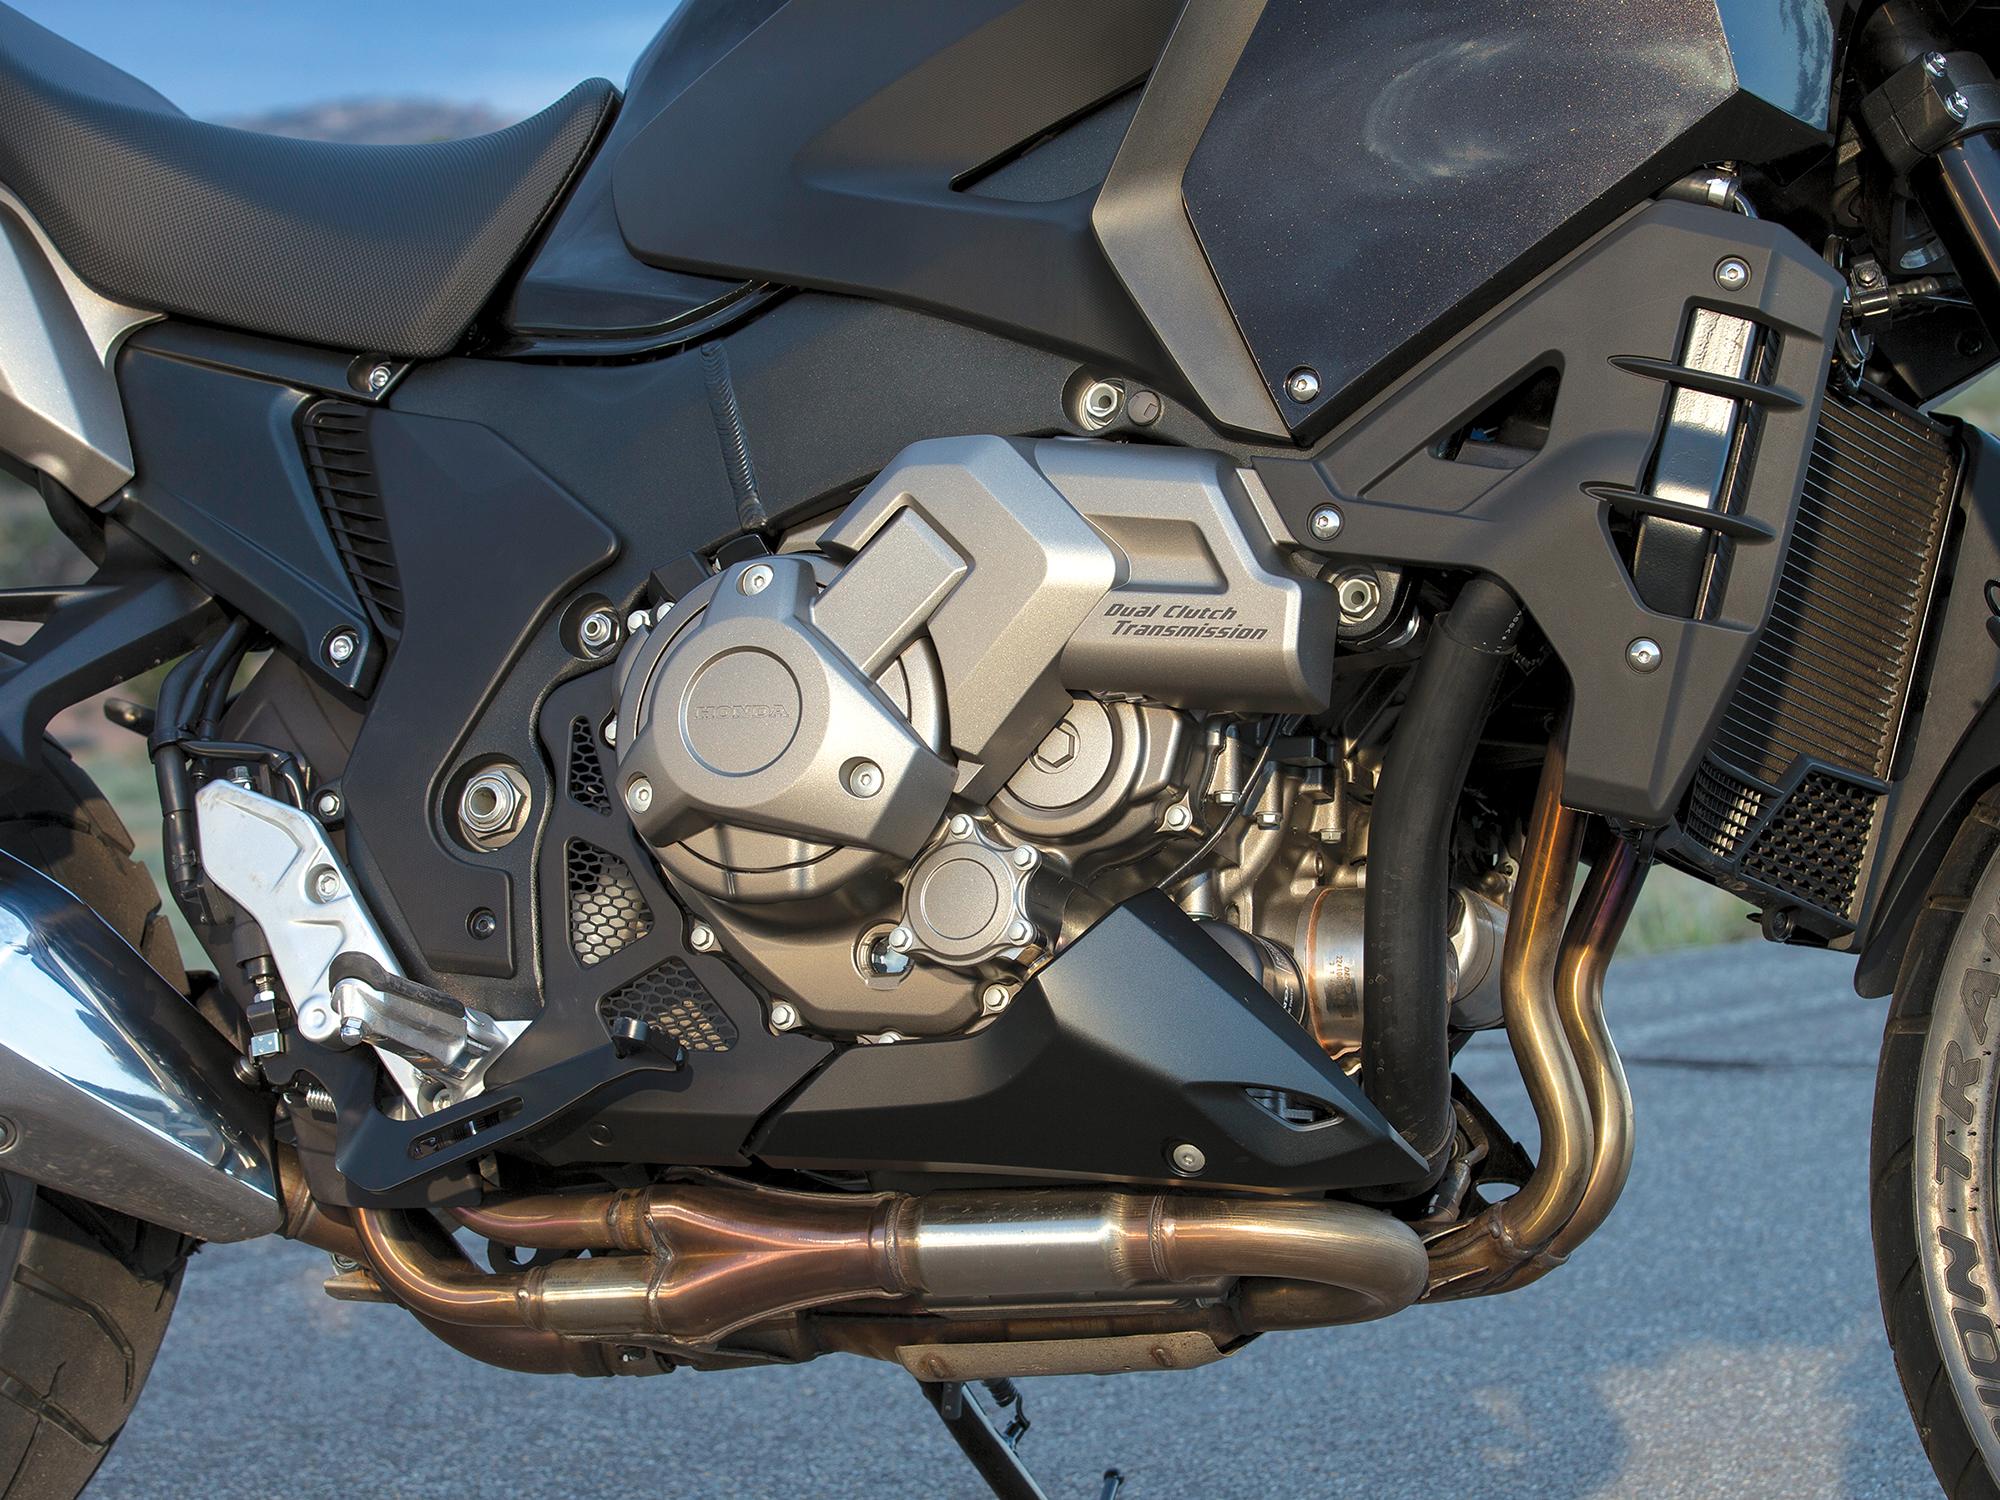 2016 Honda VFR1200X First Ride Review | Motorcyclist